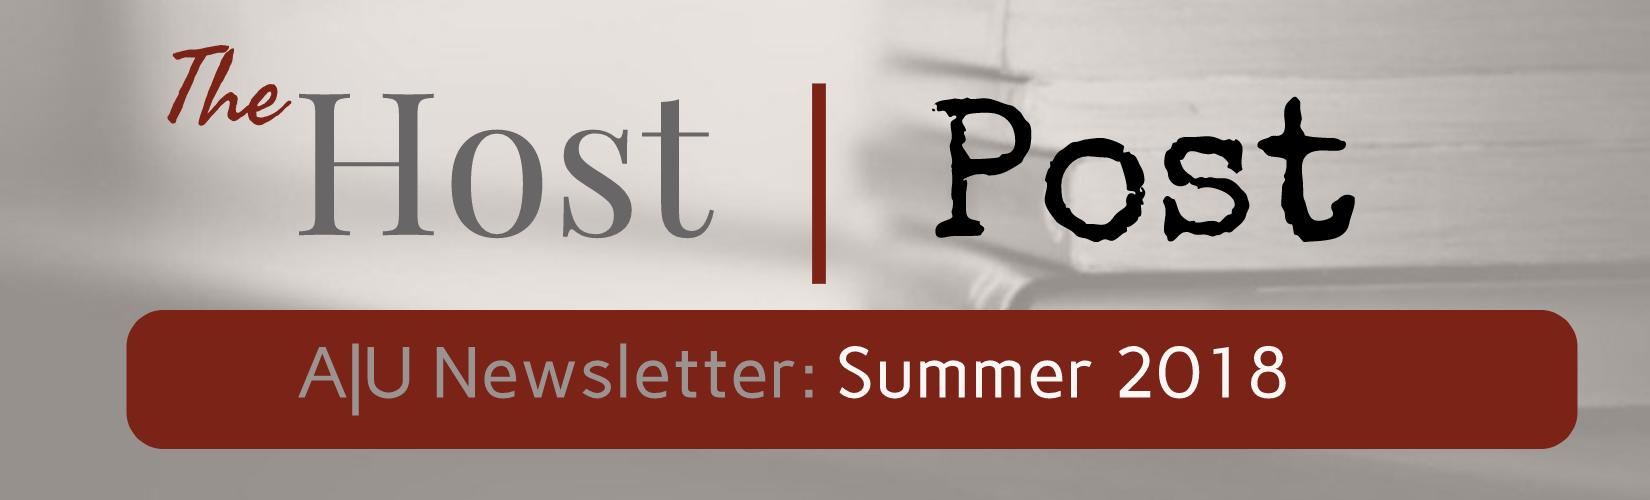 Host Post - Summer 2018.png